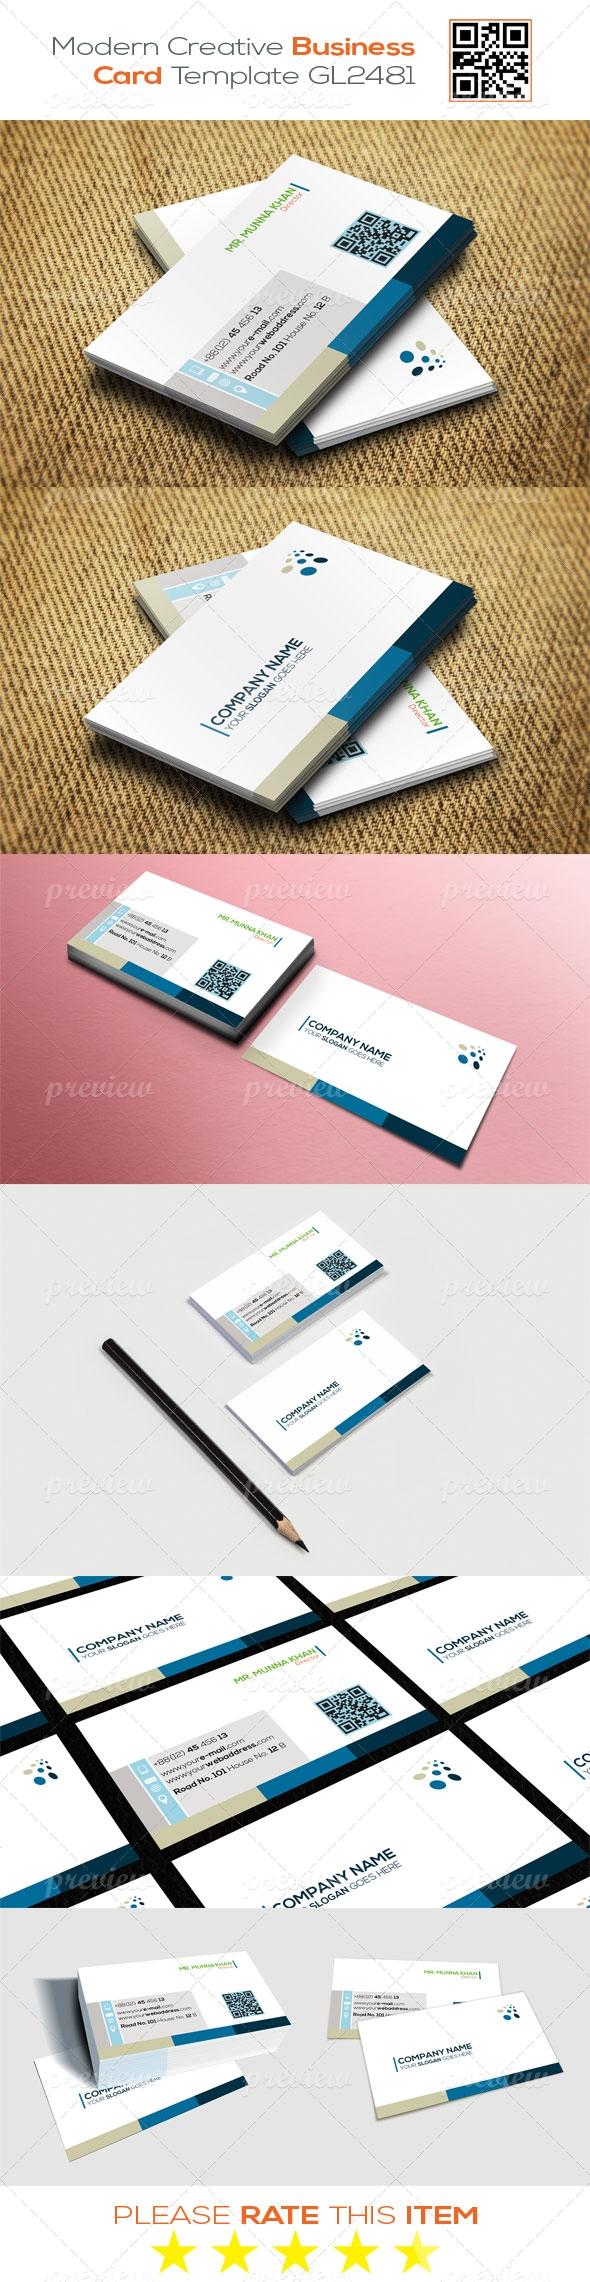 Modern Creative Business Card Template GL2481